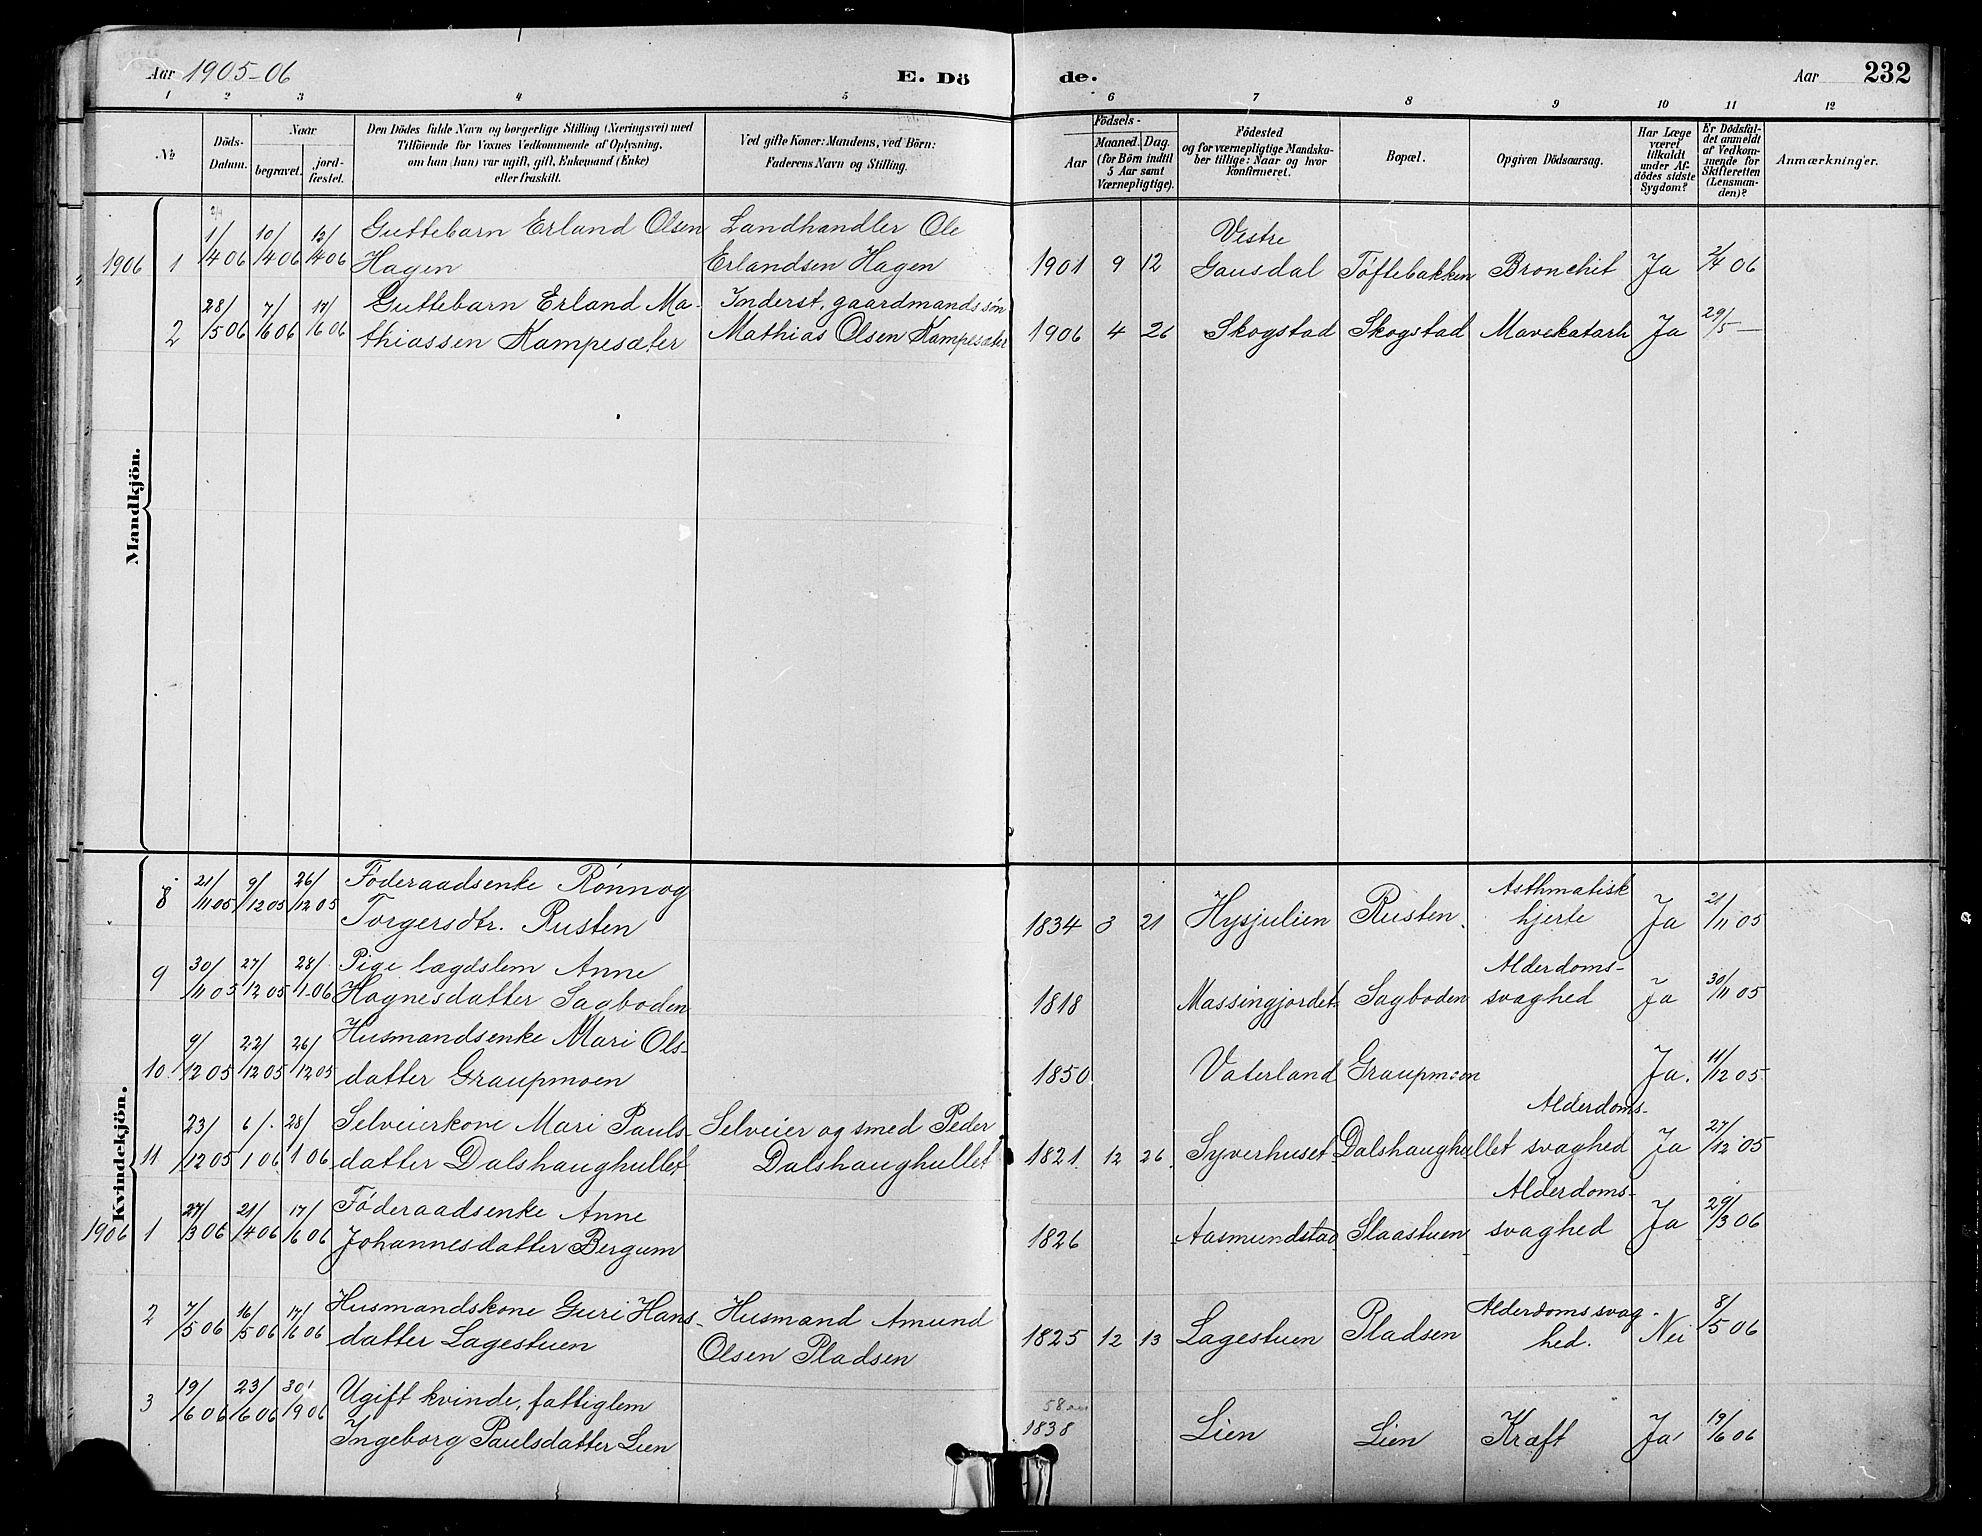 SAH, Nord-Fron prestekontor, Klokkerbok nr. 5, 1884-1914, s. 232